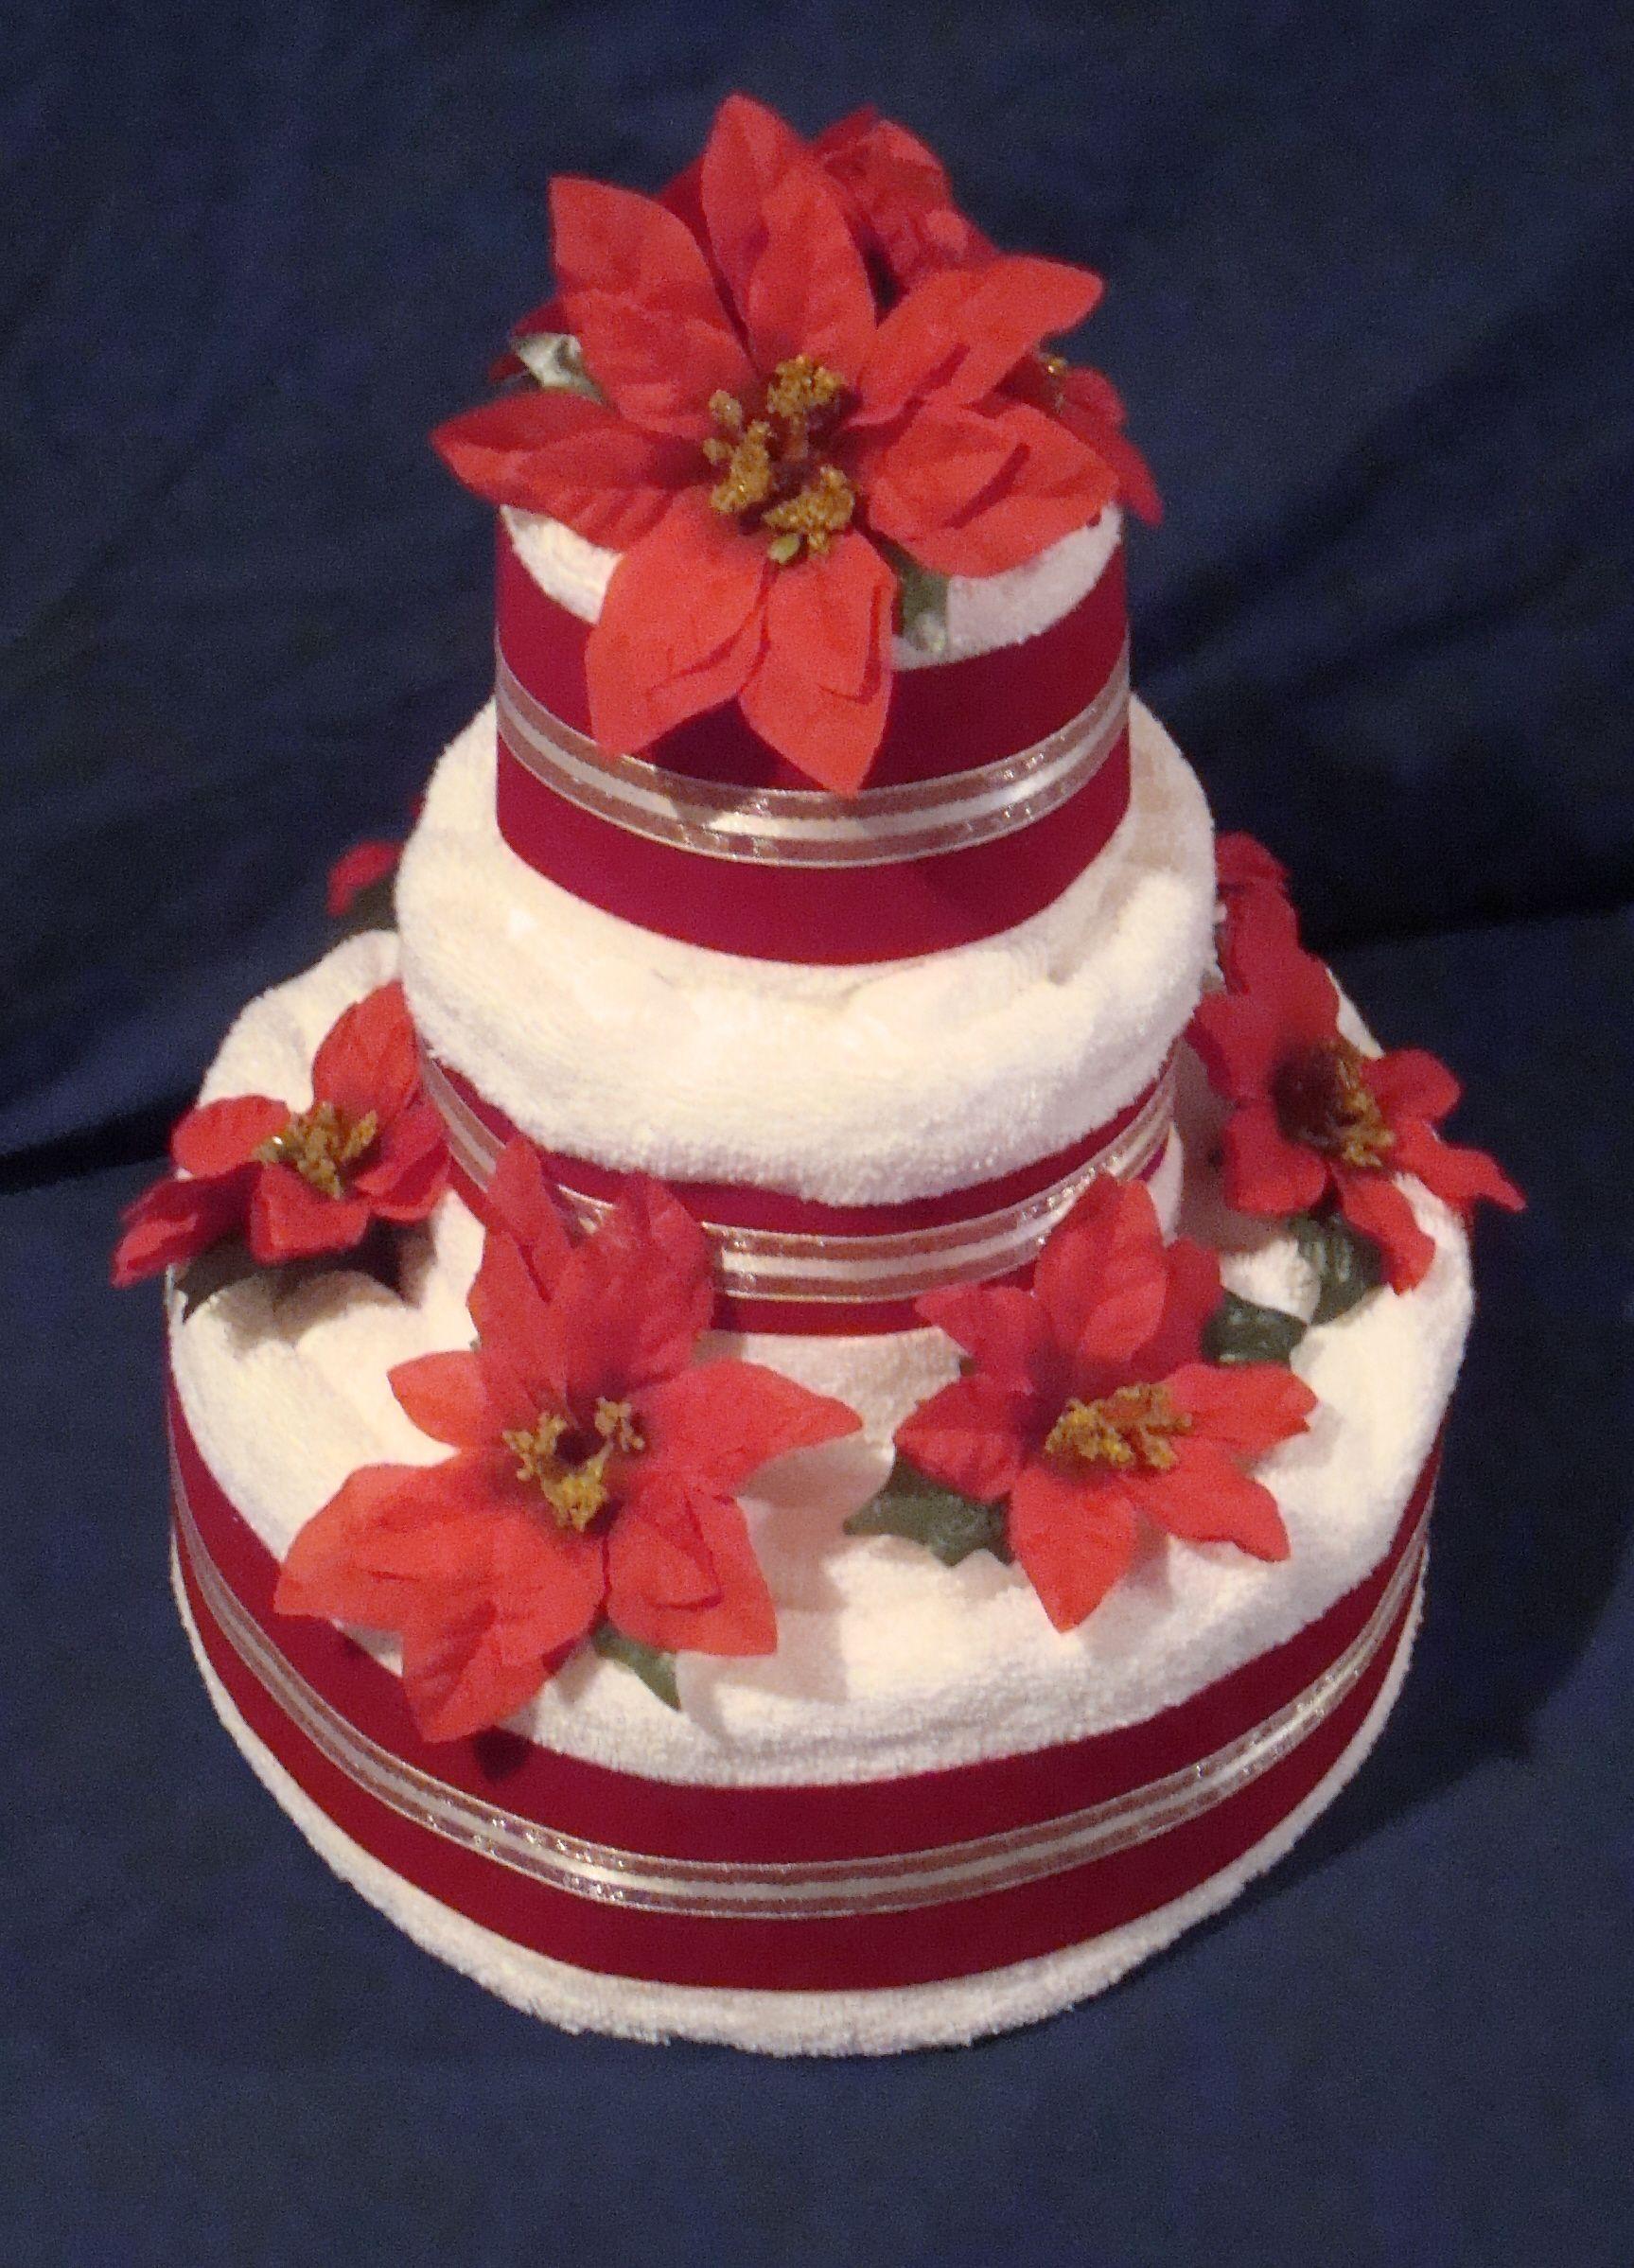 cloth cakes Google Search Christmas cake designs